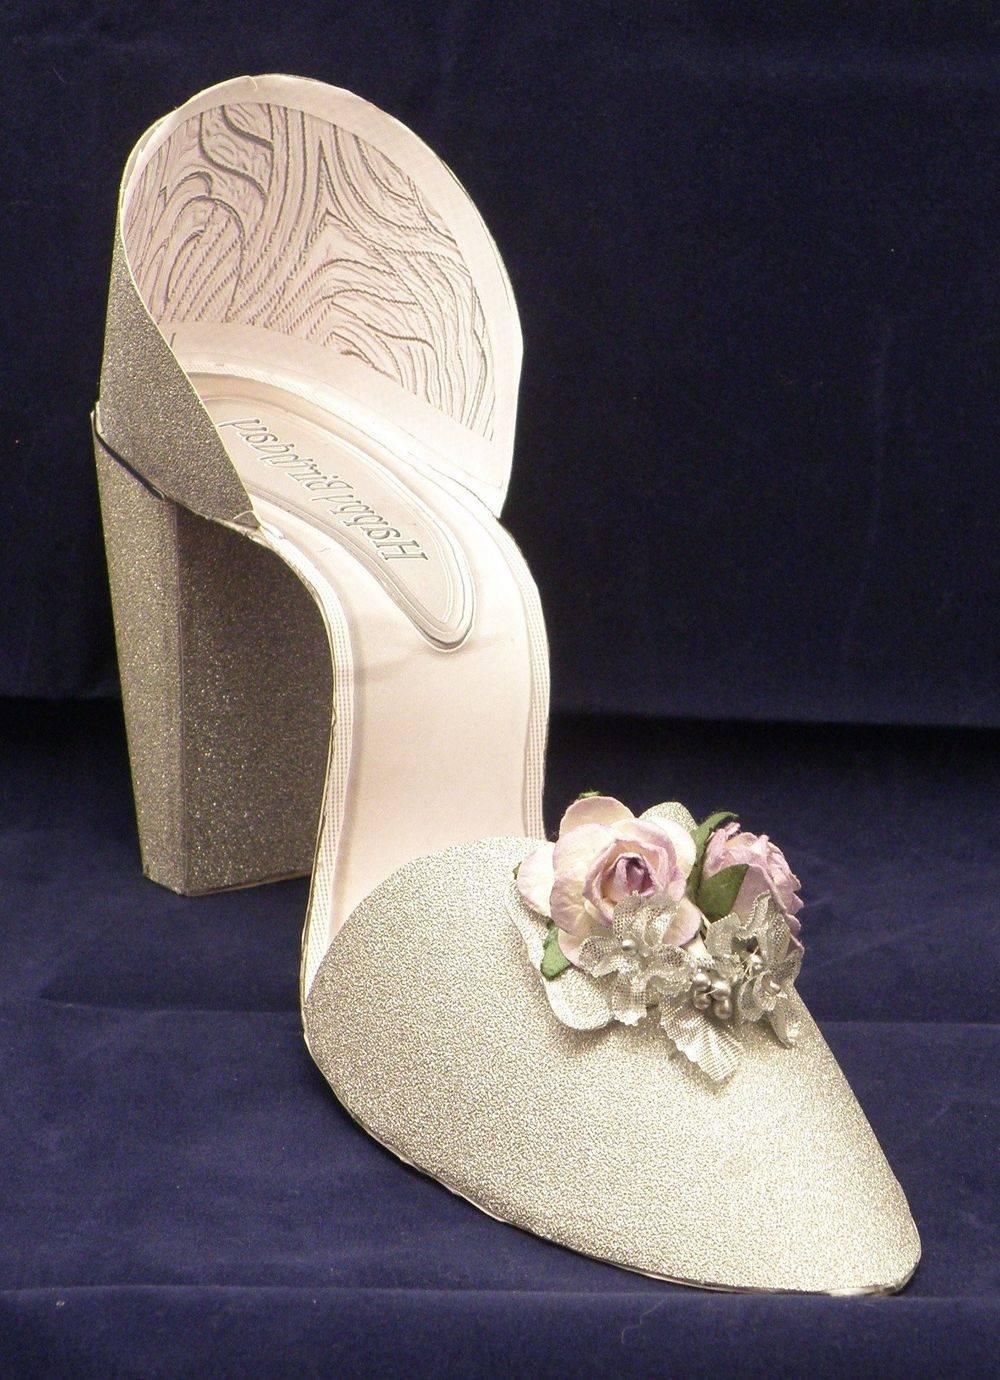 I Love Shoes - Silver Glitter - 3D shoe